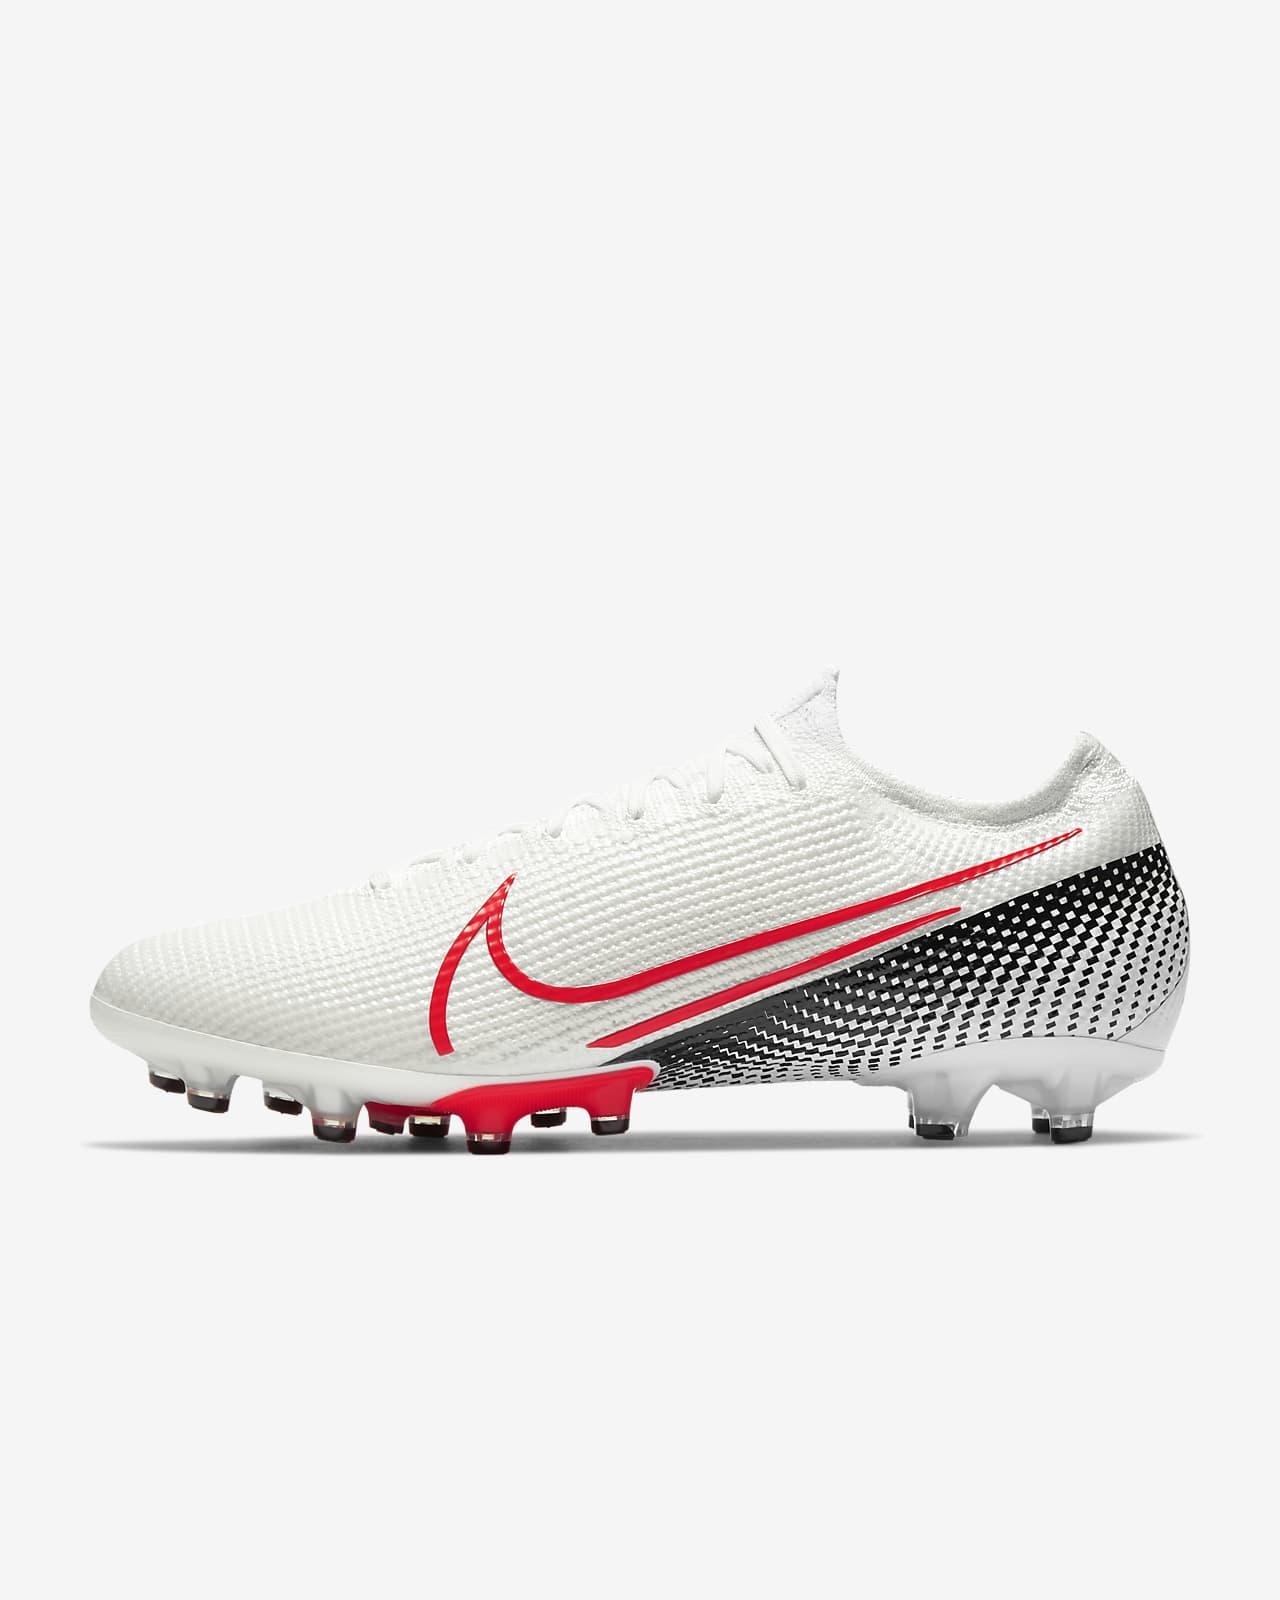 Pompeya Regreso Rico  Nike Mercurial Vapor 13 Elite AG-PRO Artificial-Grass Football Boot. Nike MA